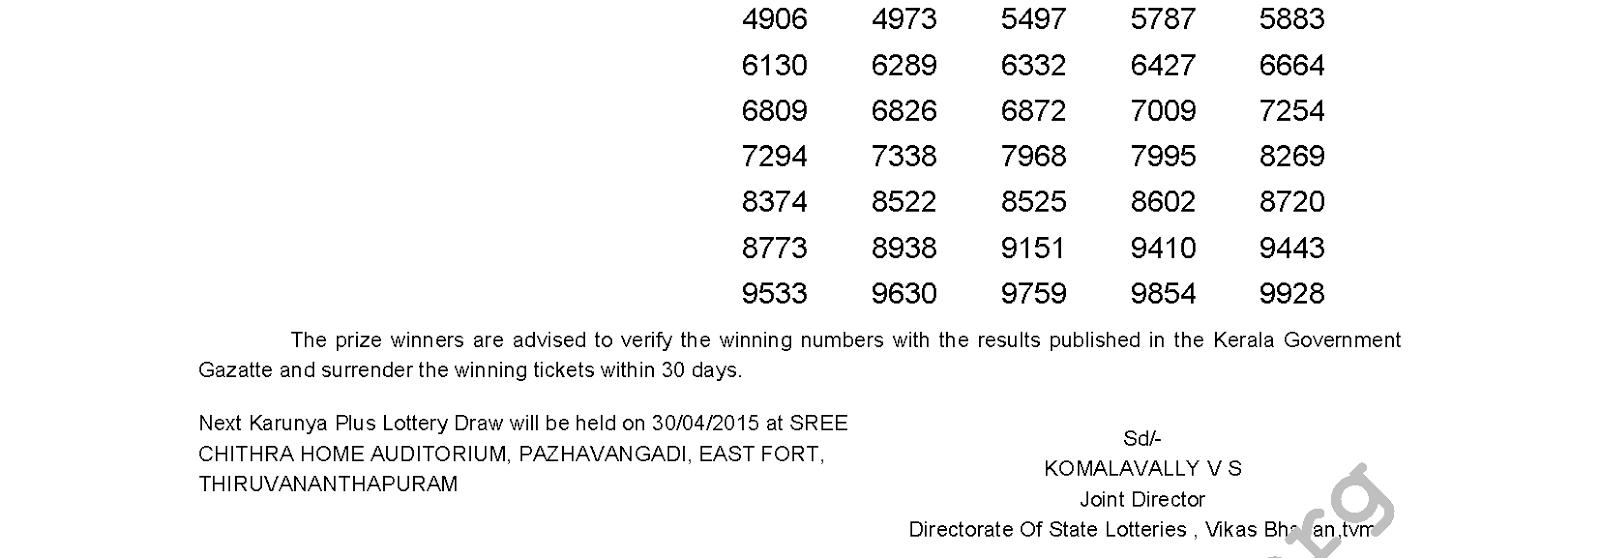 Karunya Plus Lottery KN 54 Result 23-4-2015